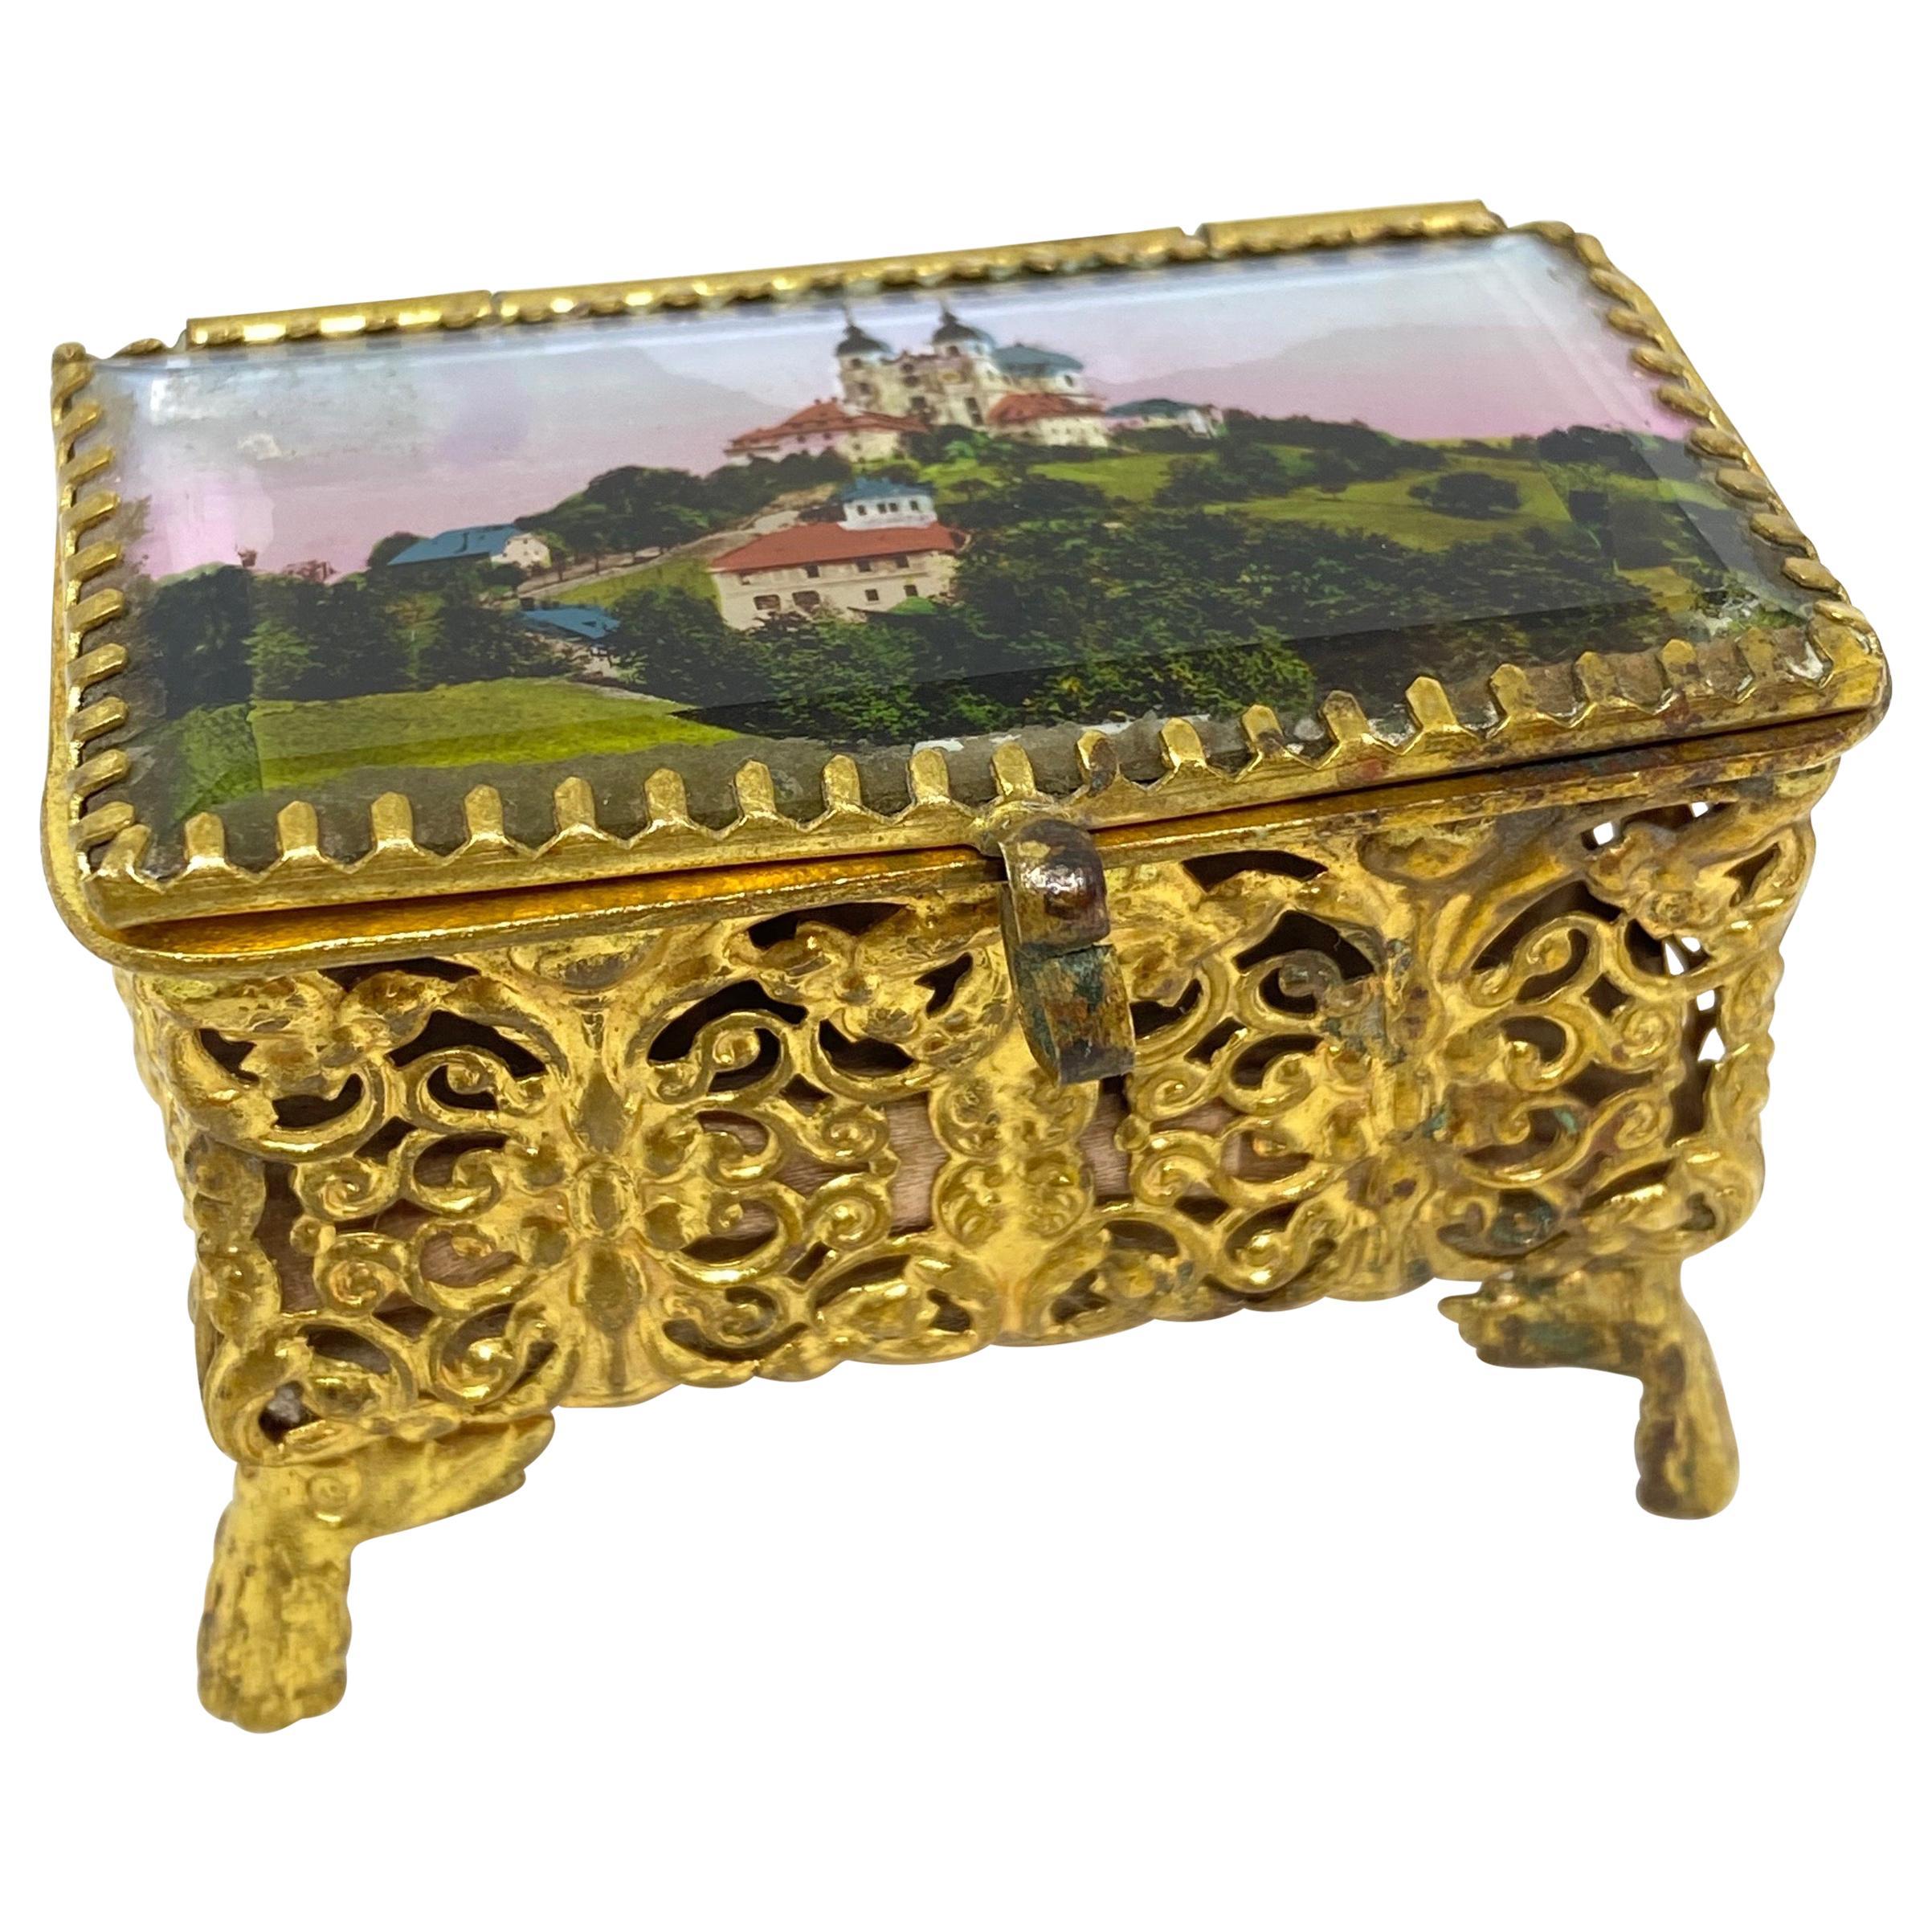 Antique German Casket Trinket Box Ormolu Glass Satin City Souvenir, 1900s